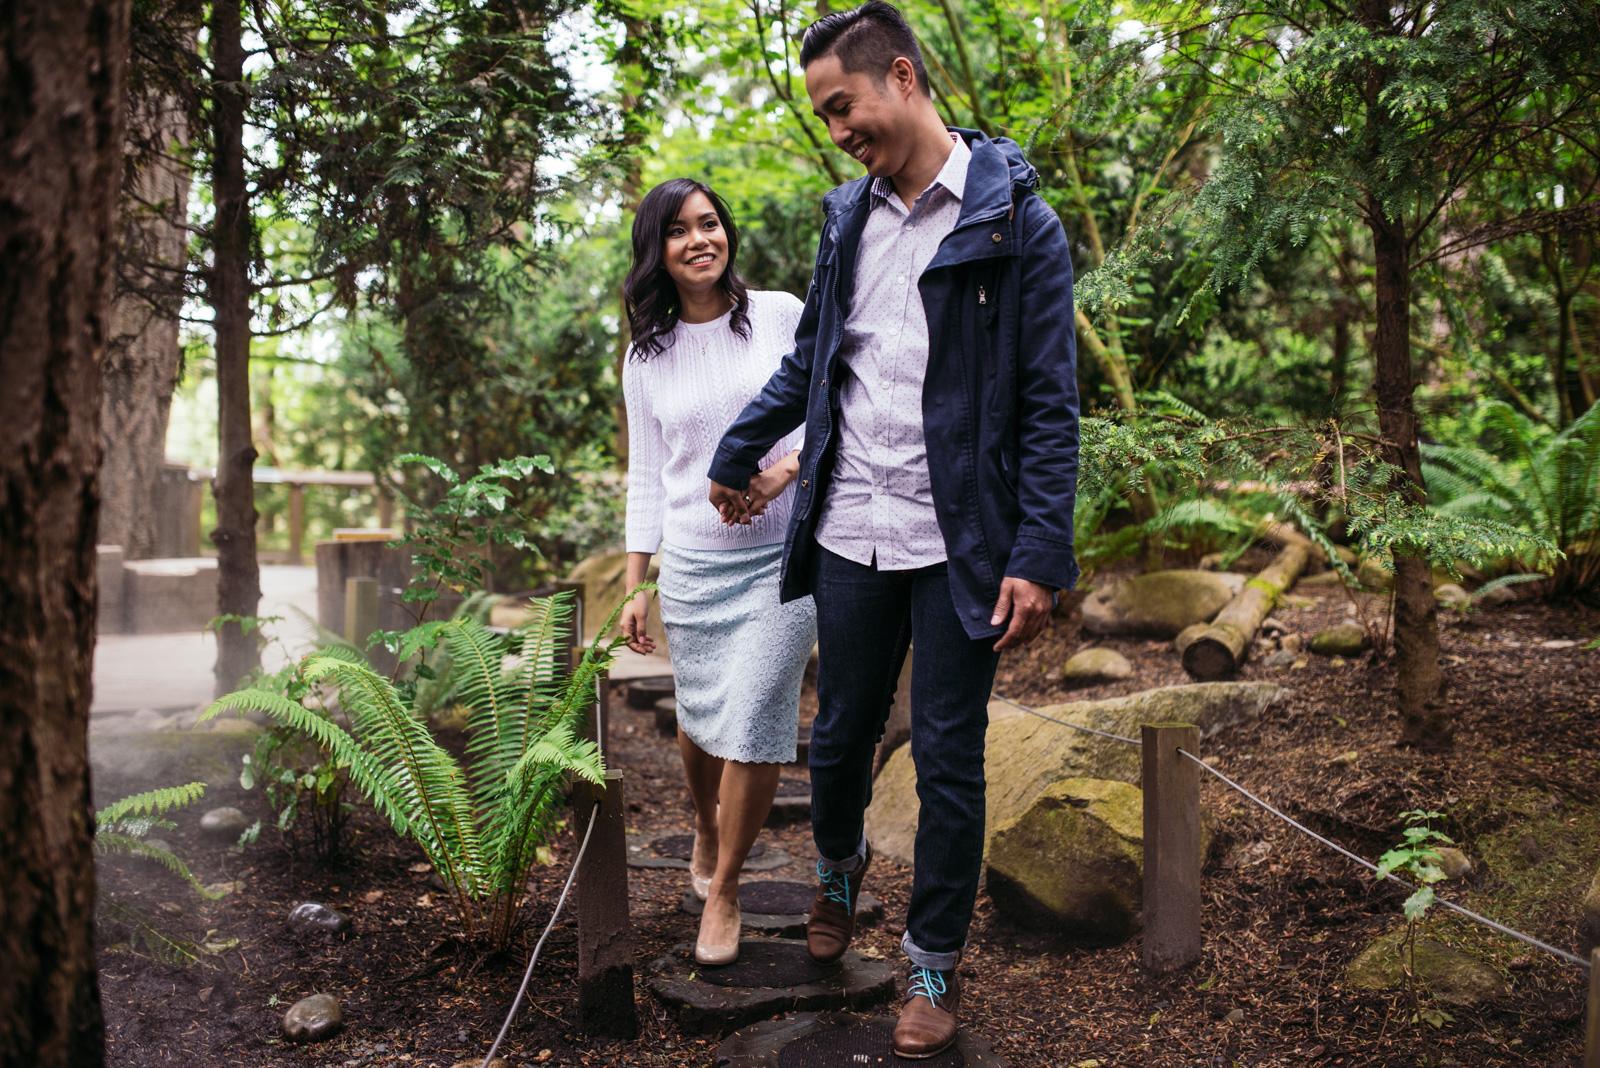 vancouver-island-wedding-photographers-capilano-suspension-bridge-engagement-5.jpg